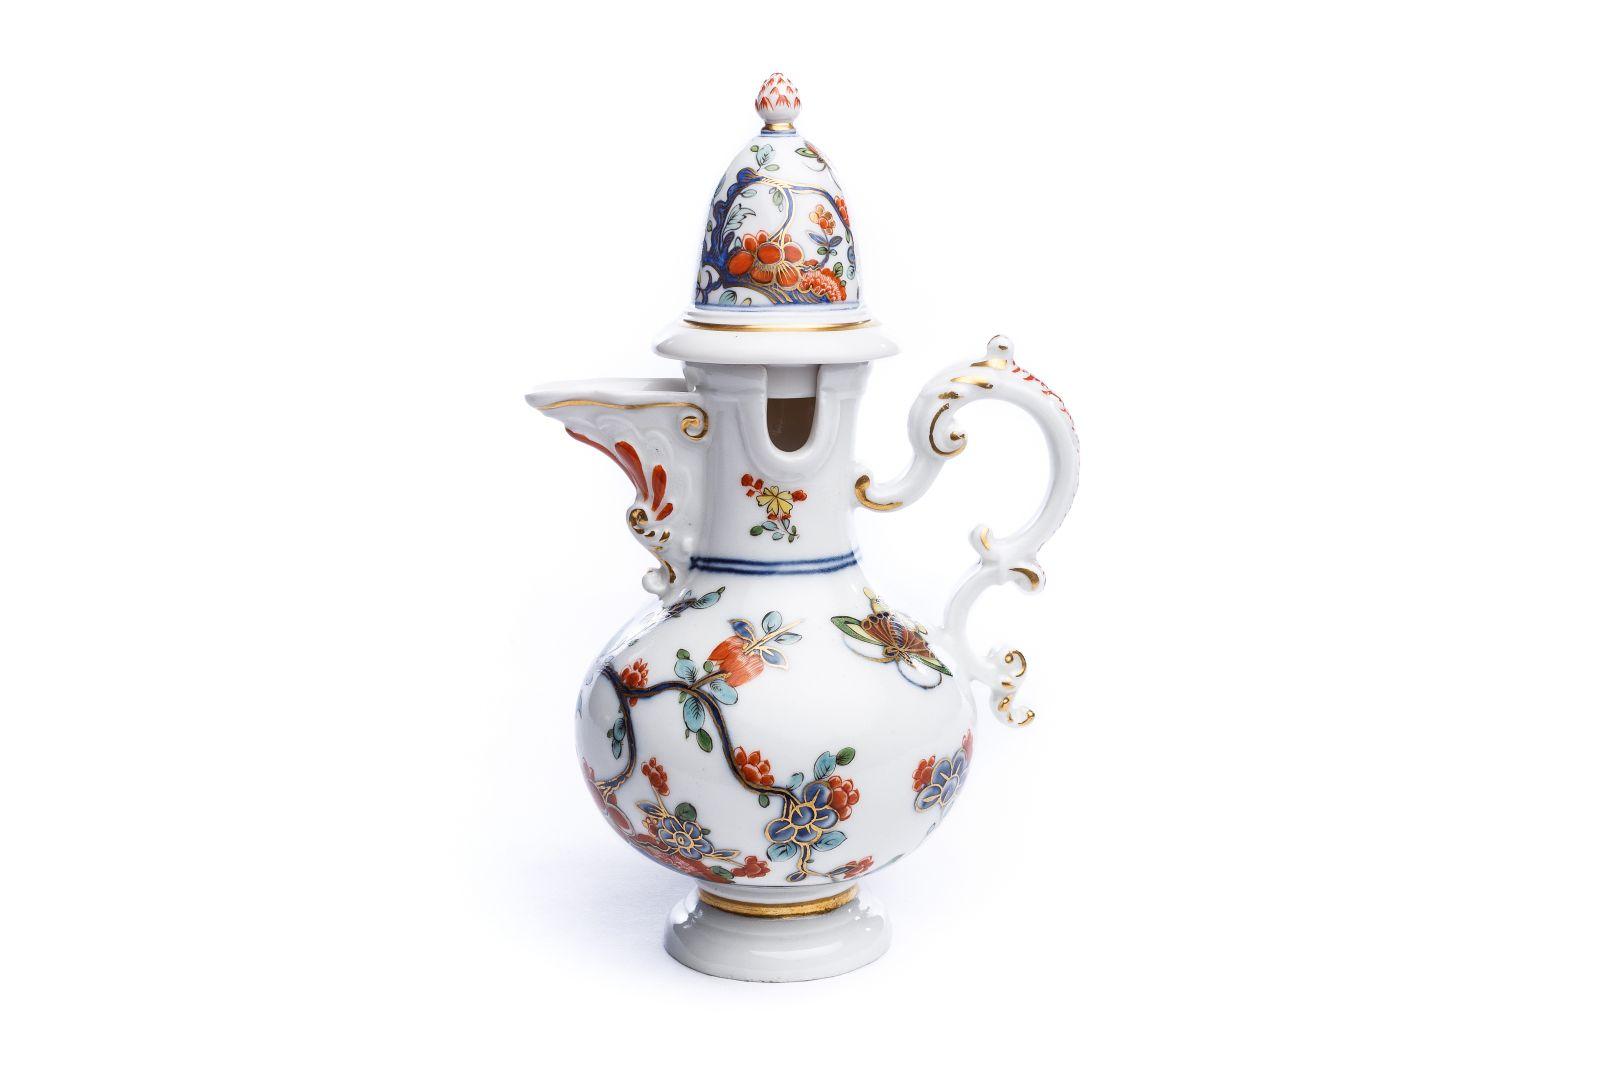 #34 Rare lidded jug, Meissen 1735 | Seltene Deckelkanne, Meissen 1735 Image